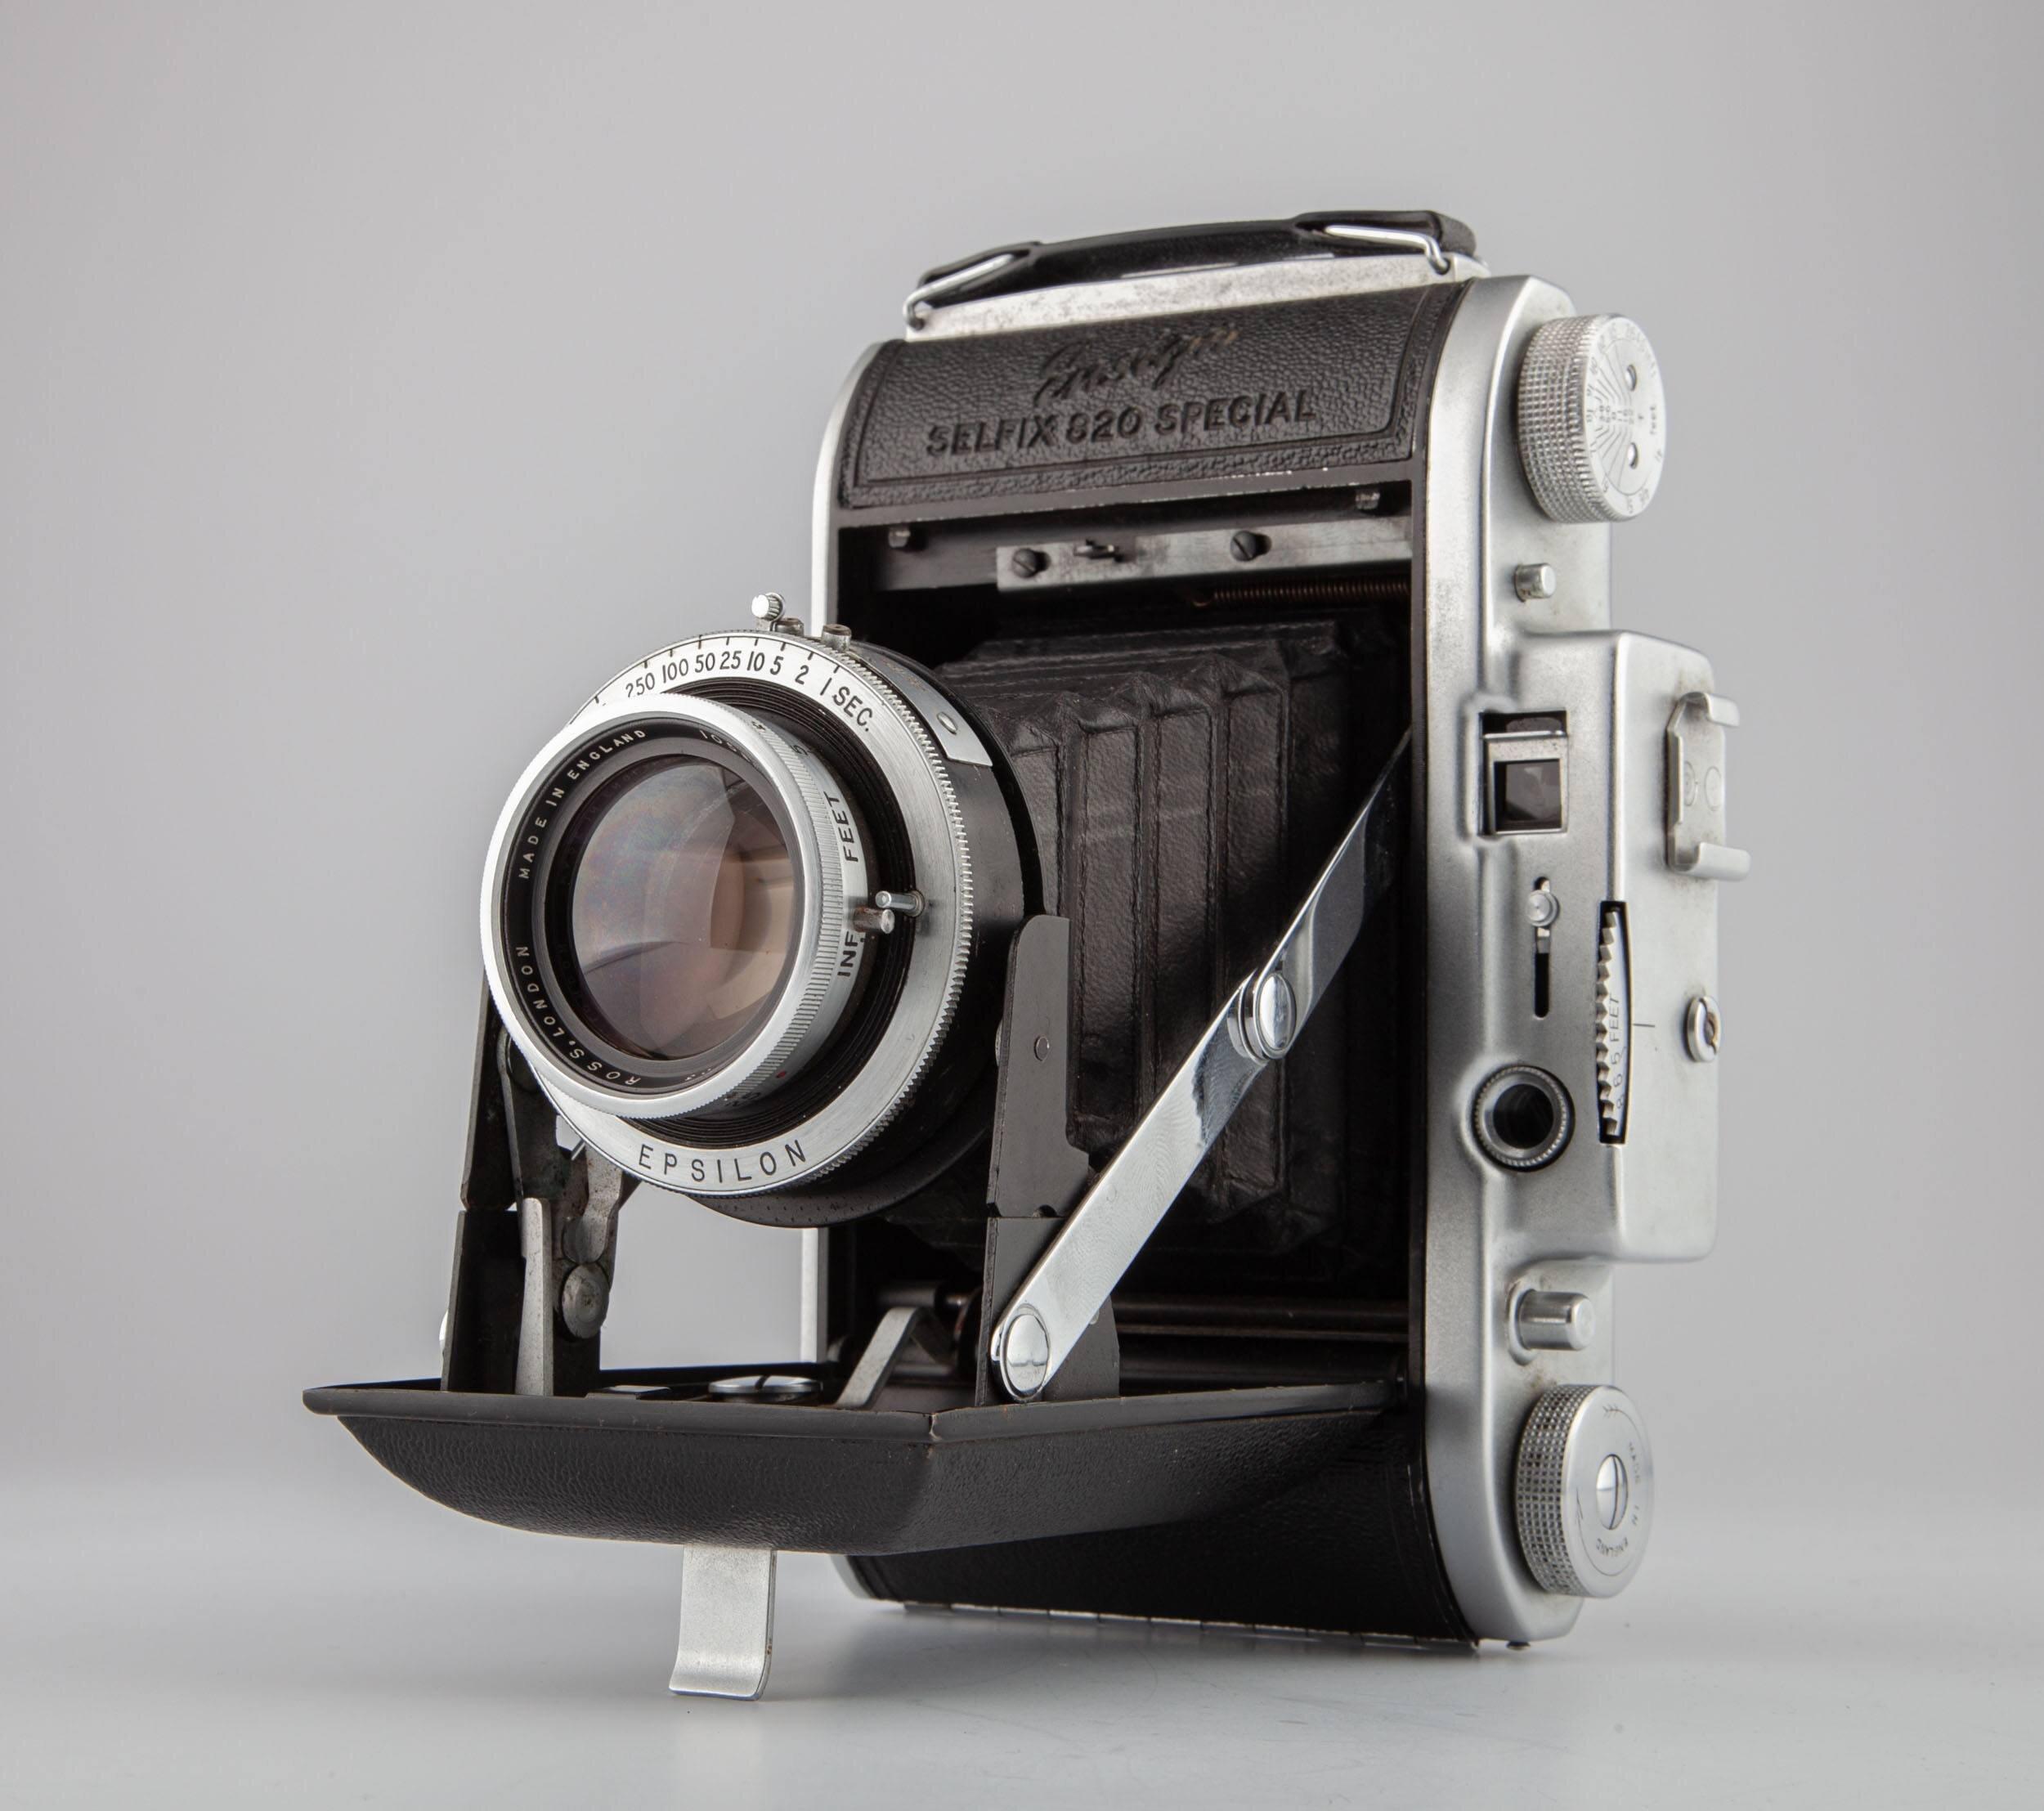 Ensign Selfix 820 Special folding camera w. Ross London 105mm Xpres f/3.8